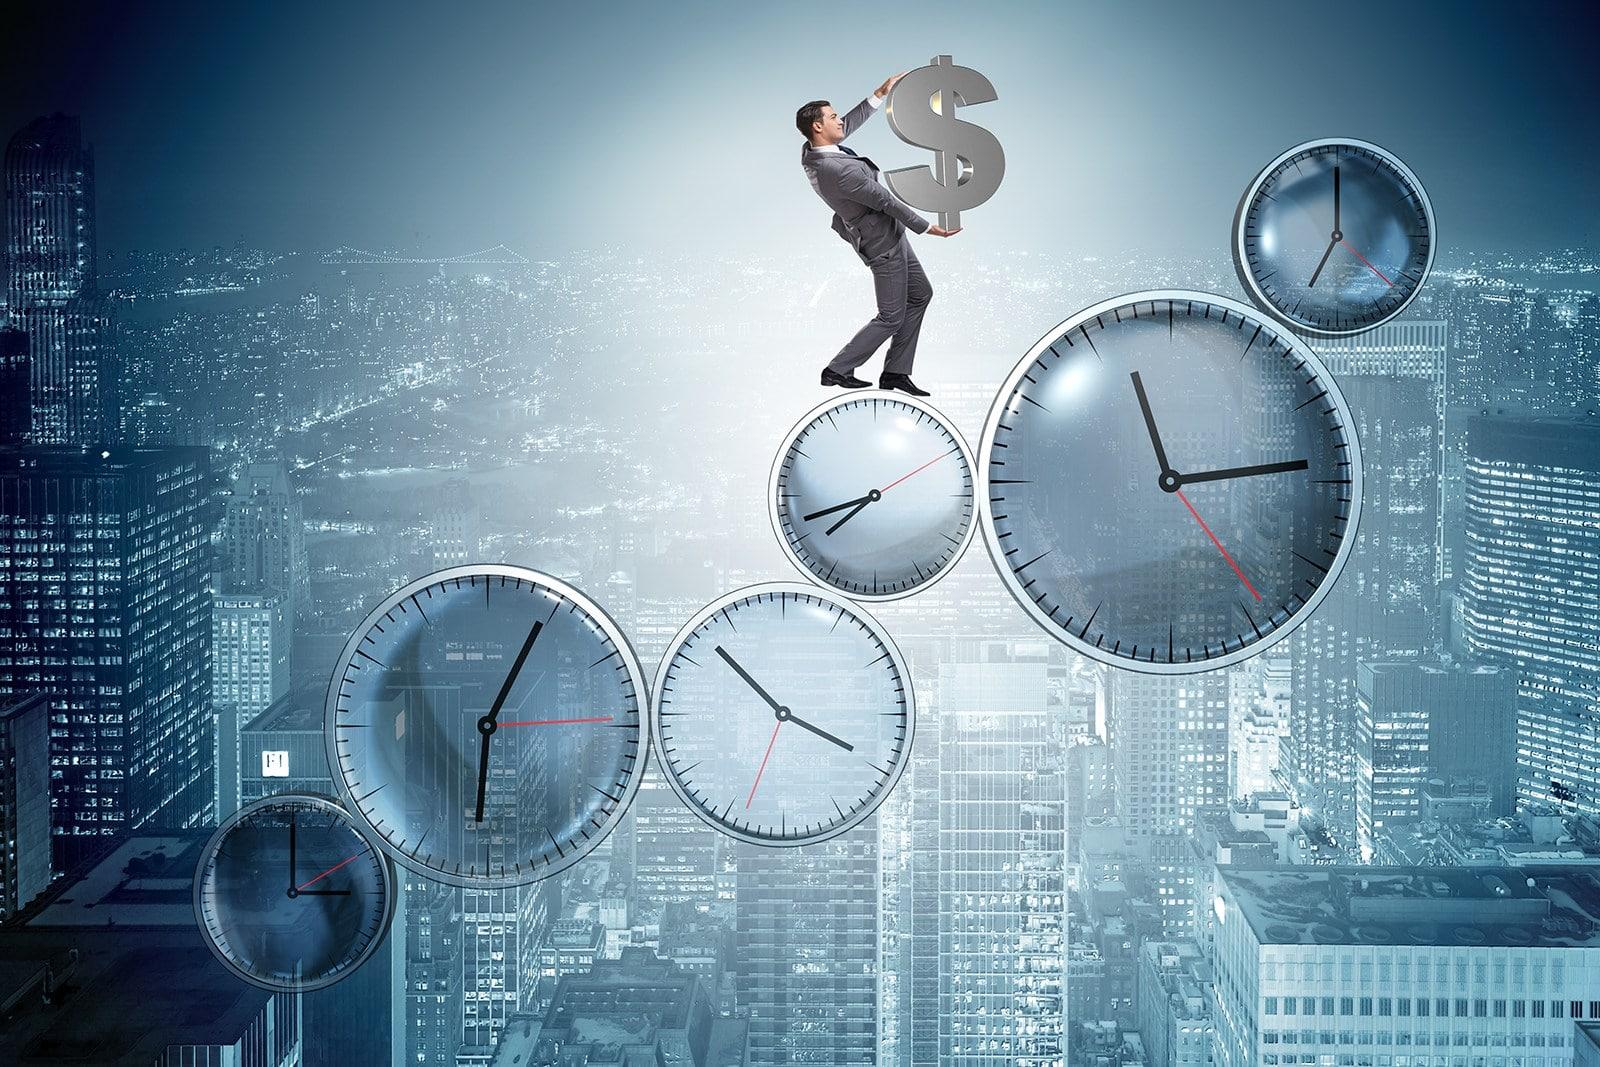 smeup time series database